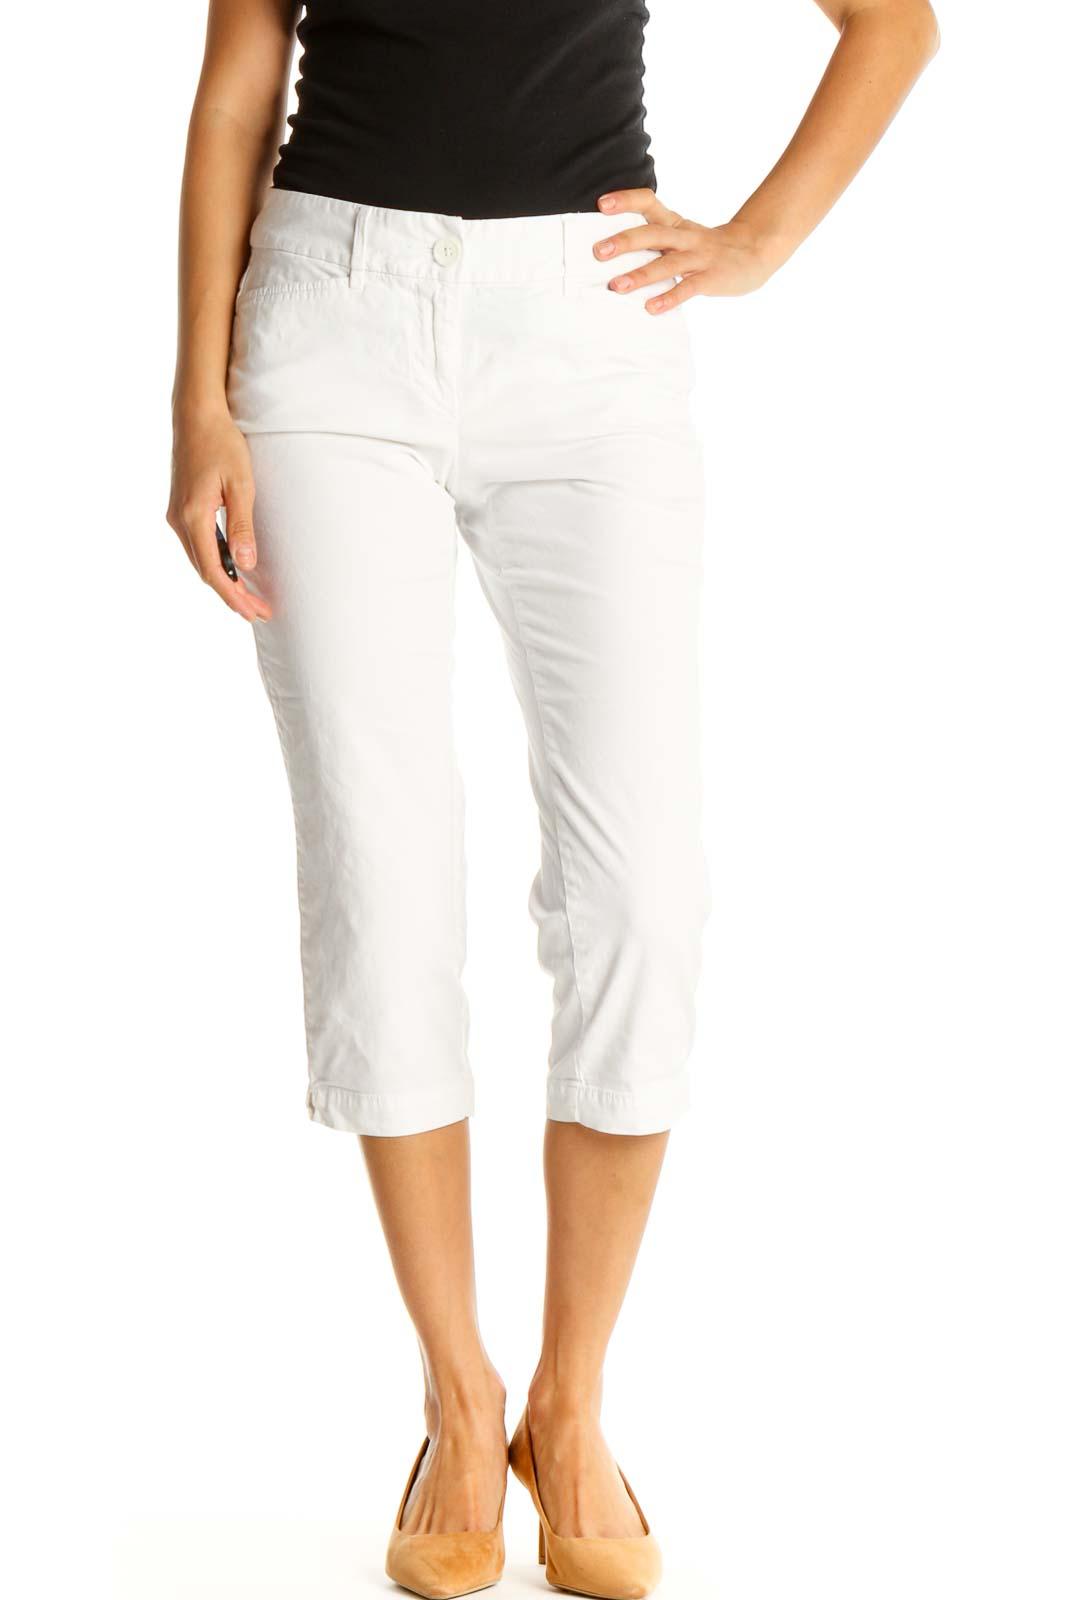 White Casual Capri Pants Front